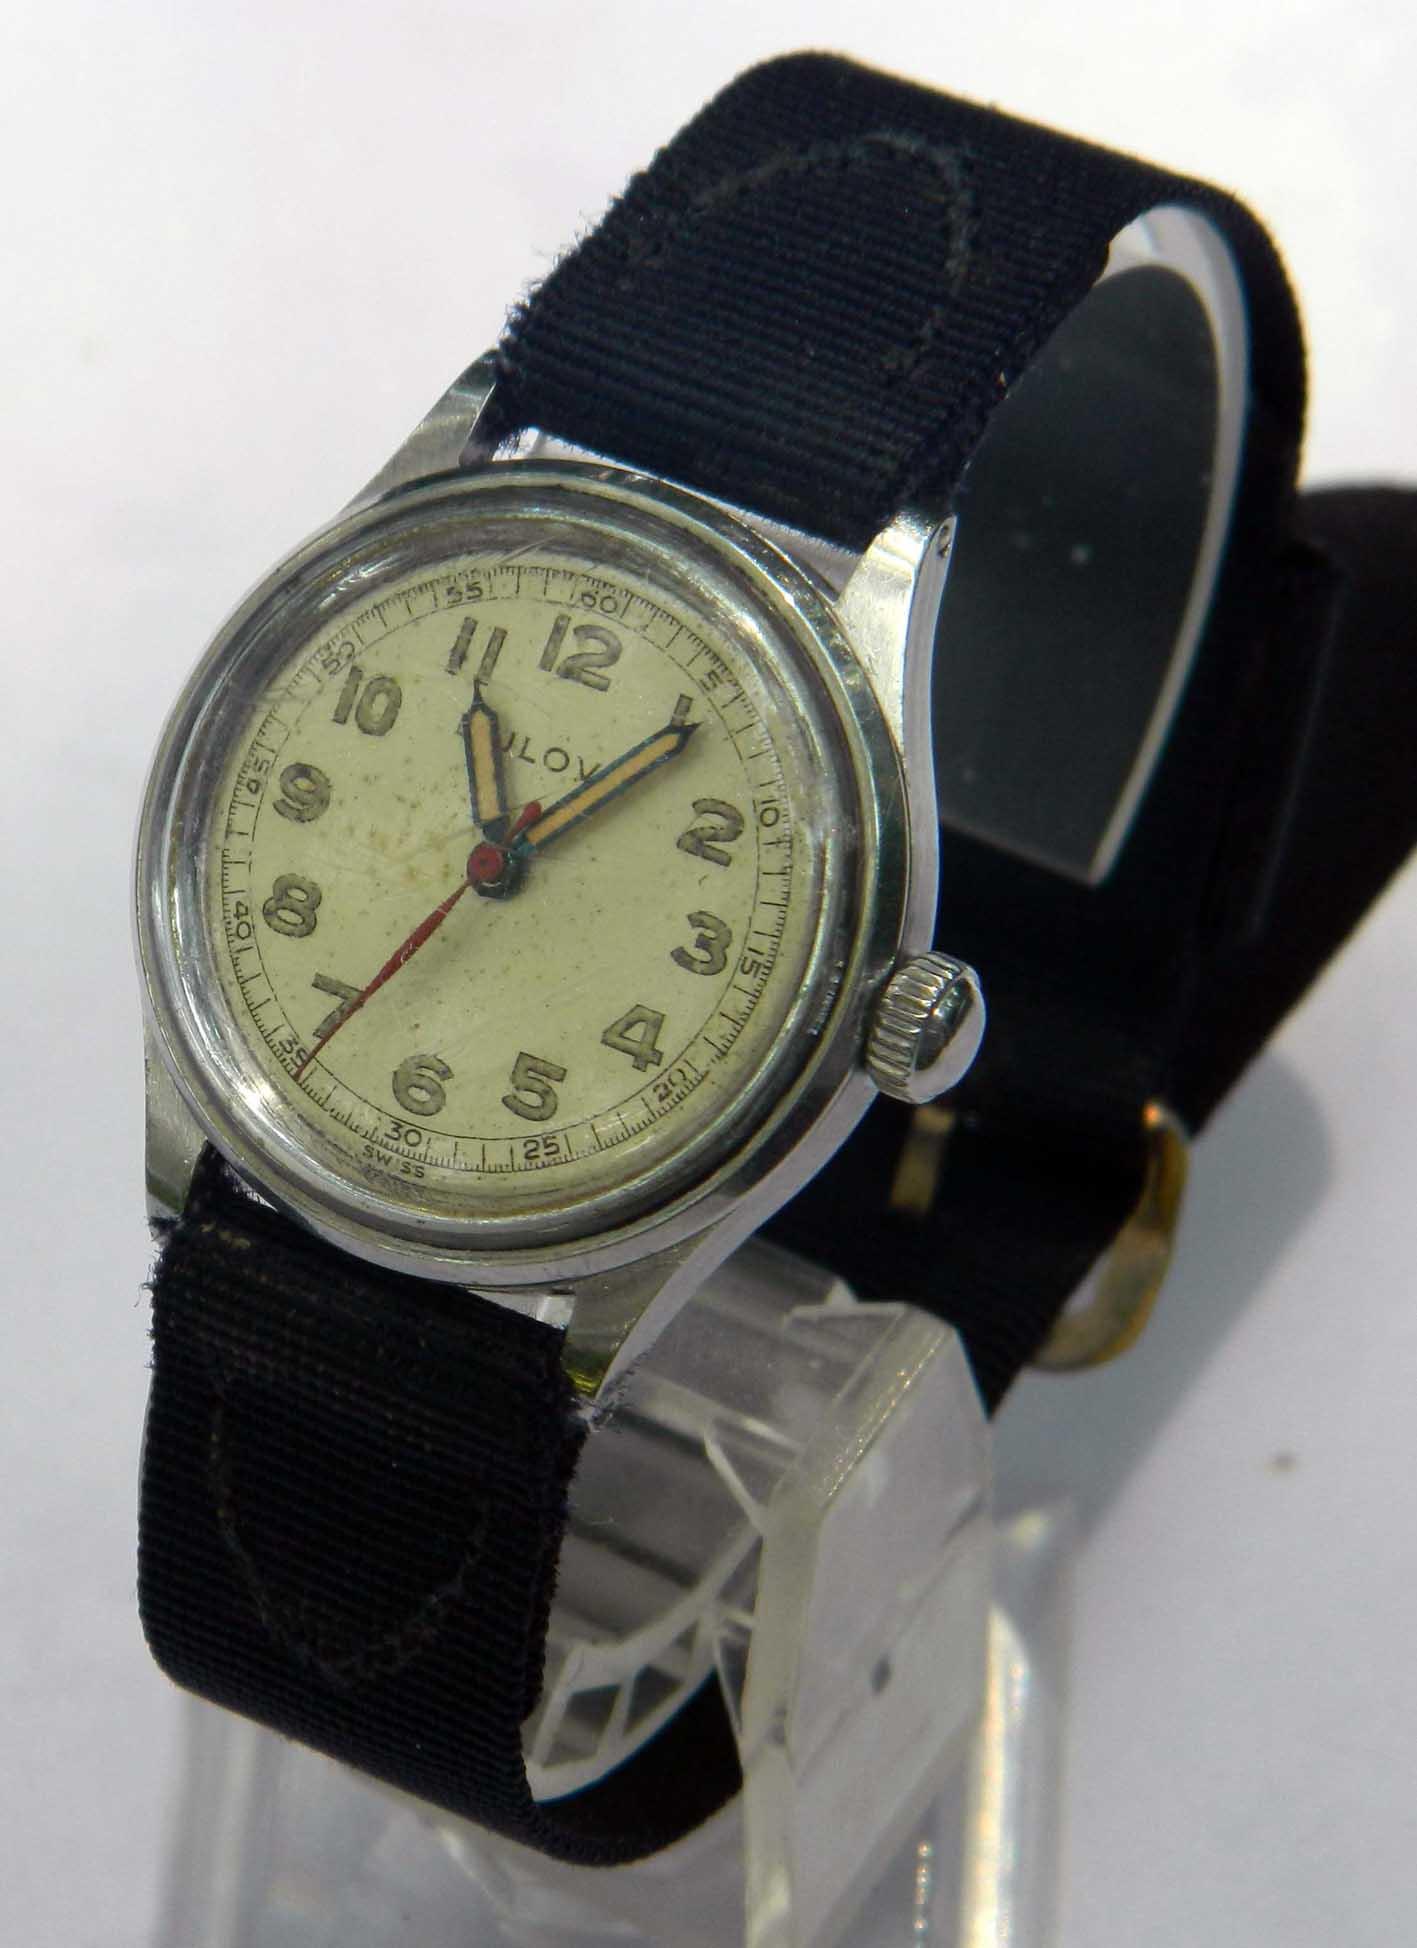 1945 seabee Bulova watch